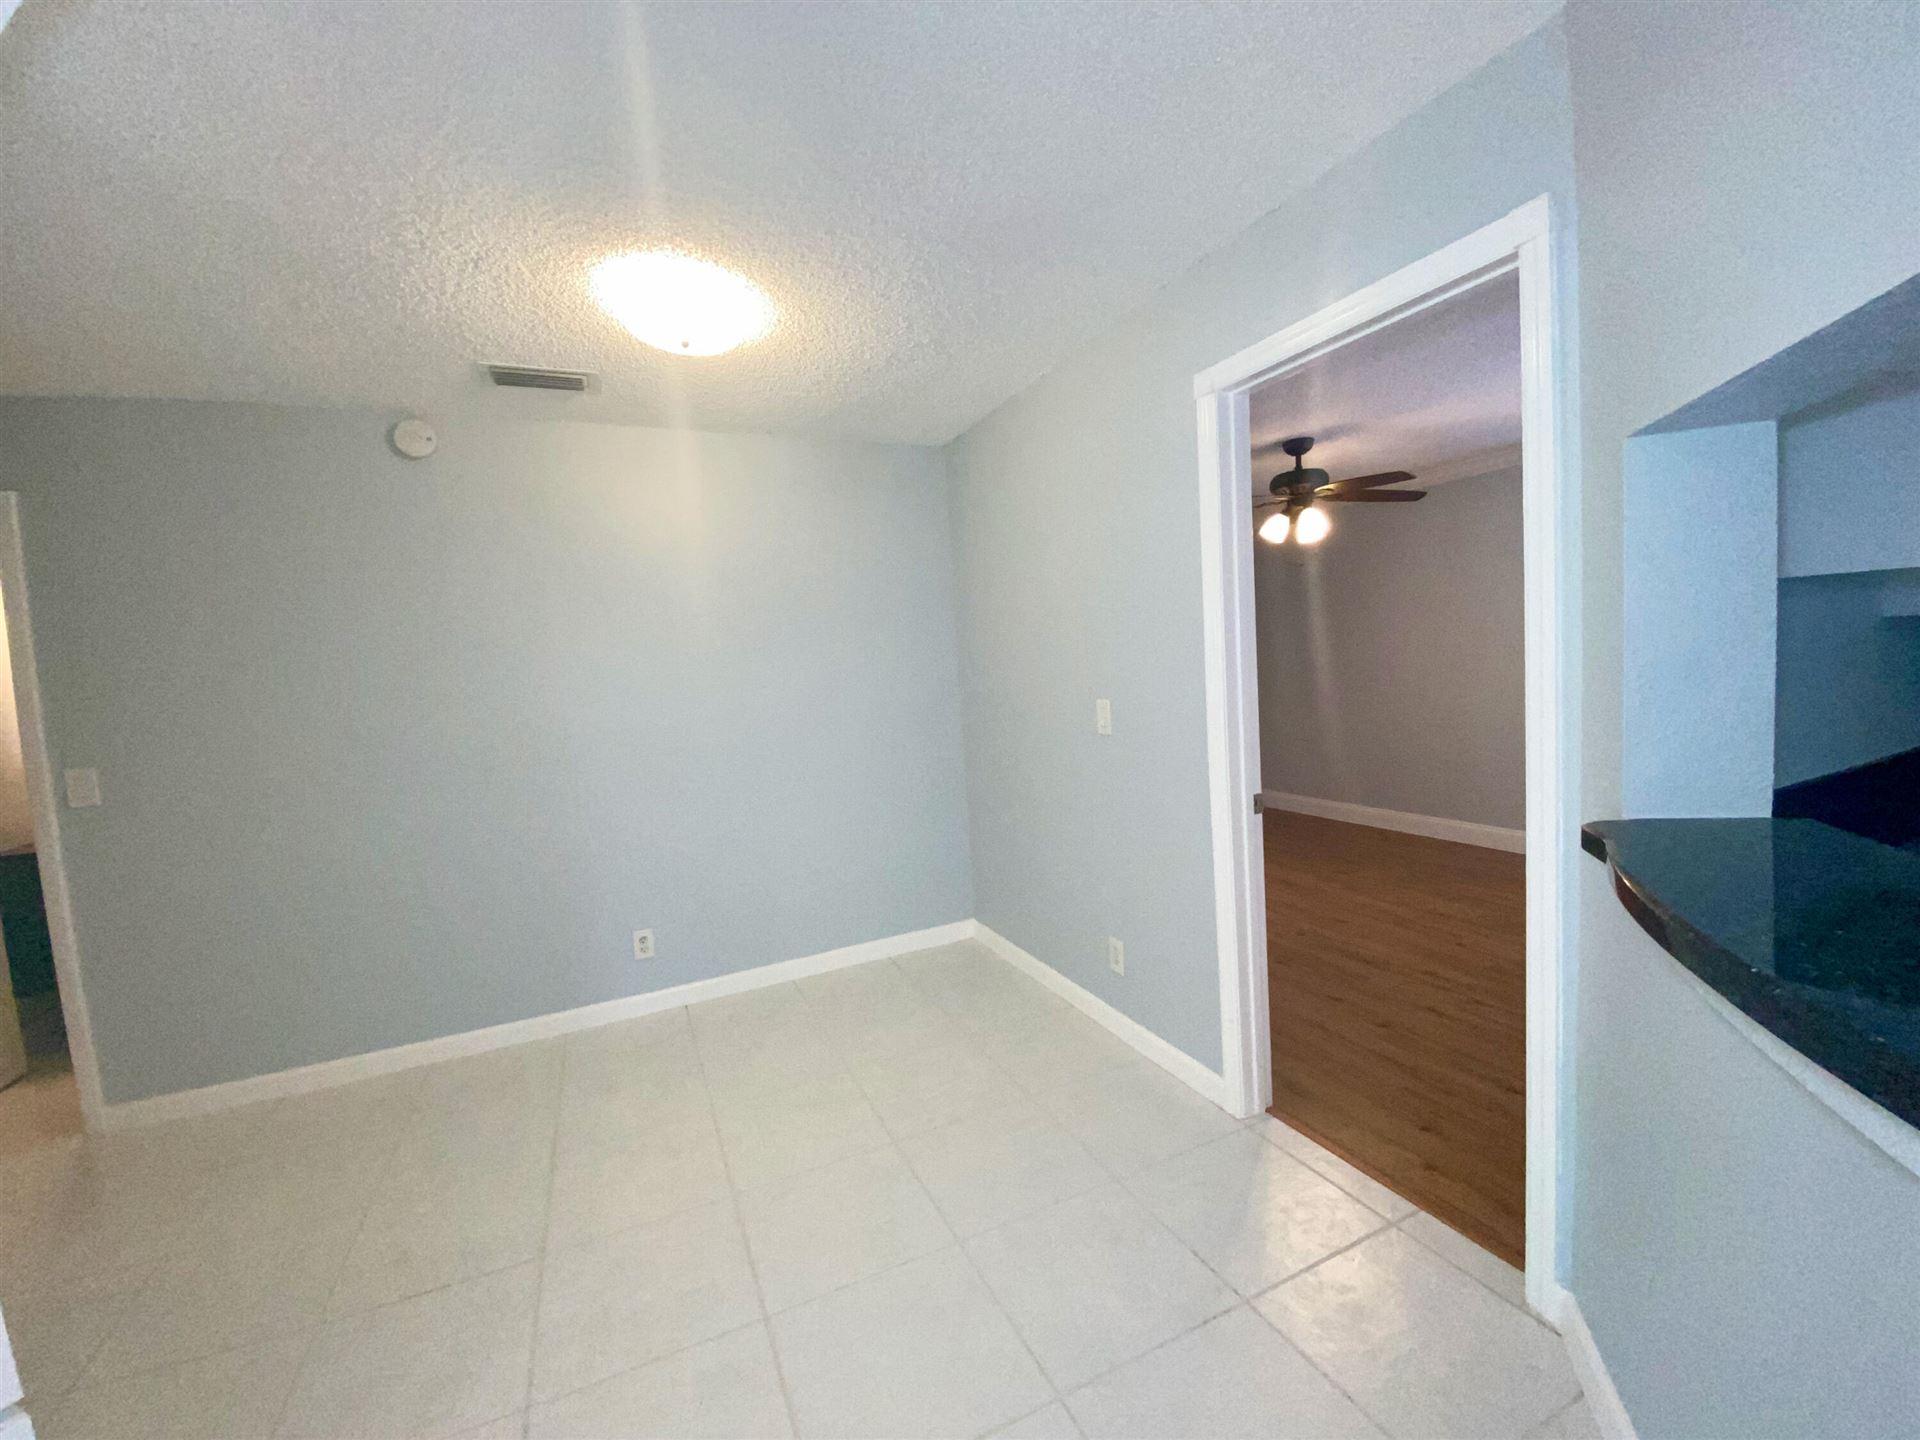 Photo of 5325 Jog Lane, Delray Beach, FL 33484 (MLS # RX-10734886)